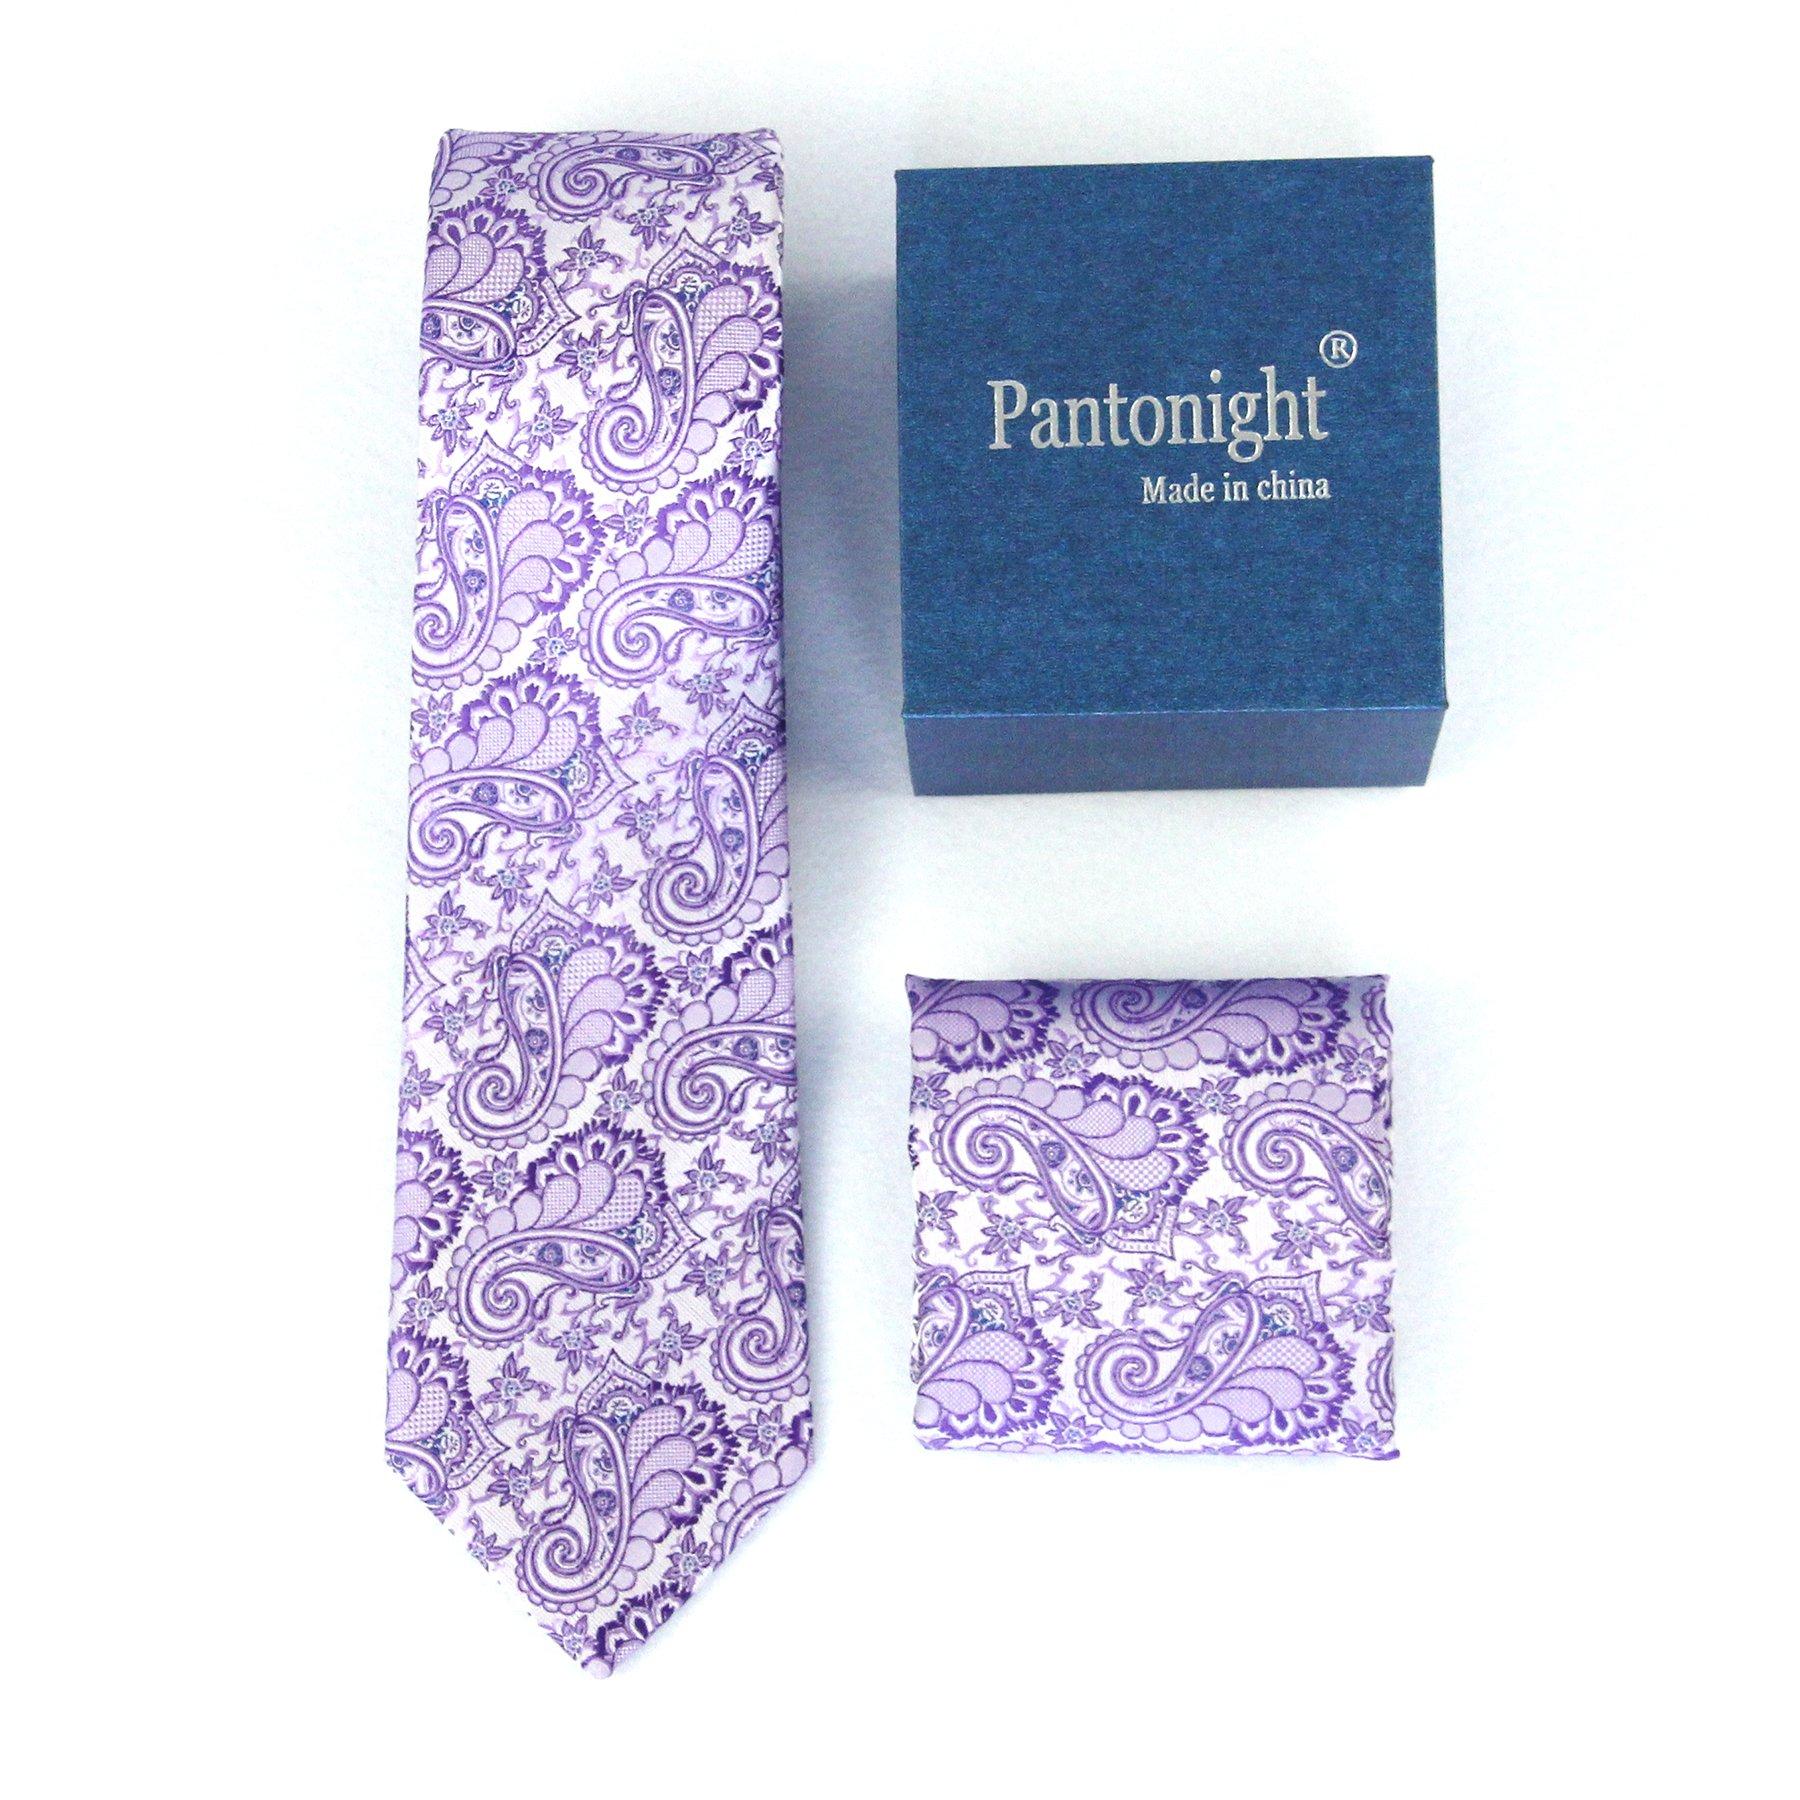 Woven Classic Ties for Men + Pocket Square Set - Jacqured Necktie Hanky Set - Mens Ties Neck Tie +gift box Multi Colors (purple paisley 133)